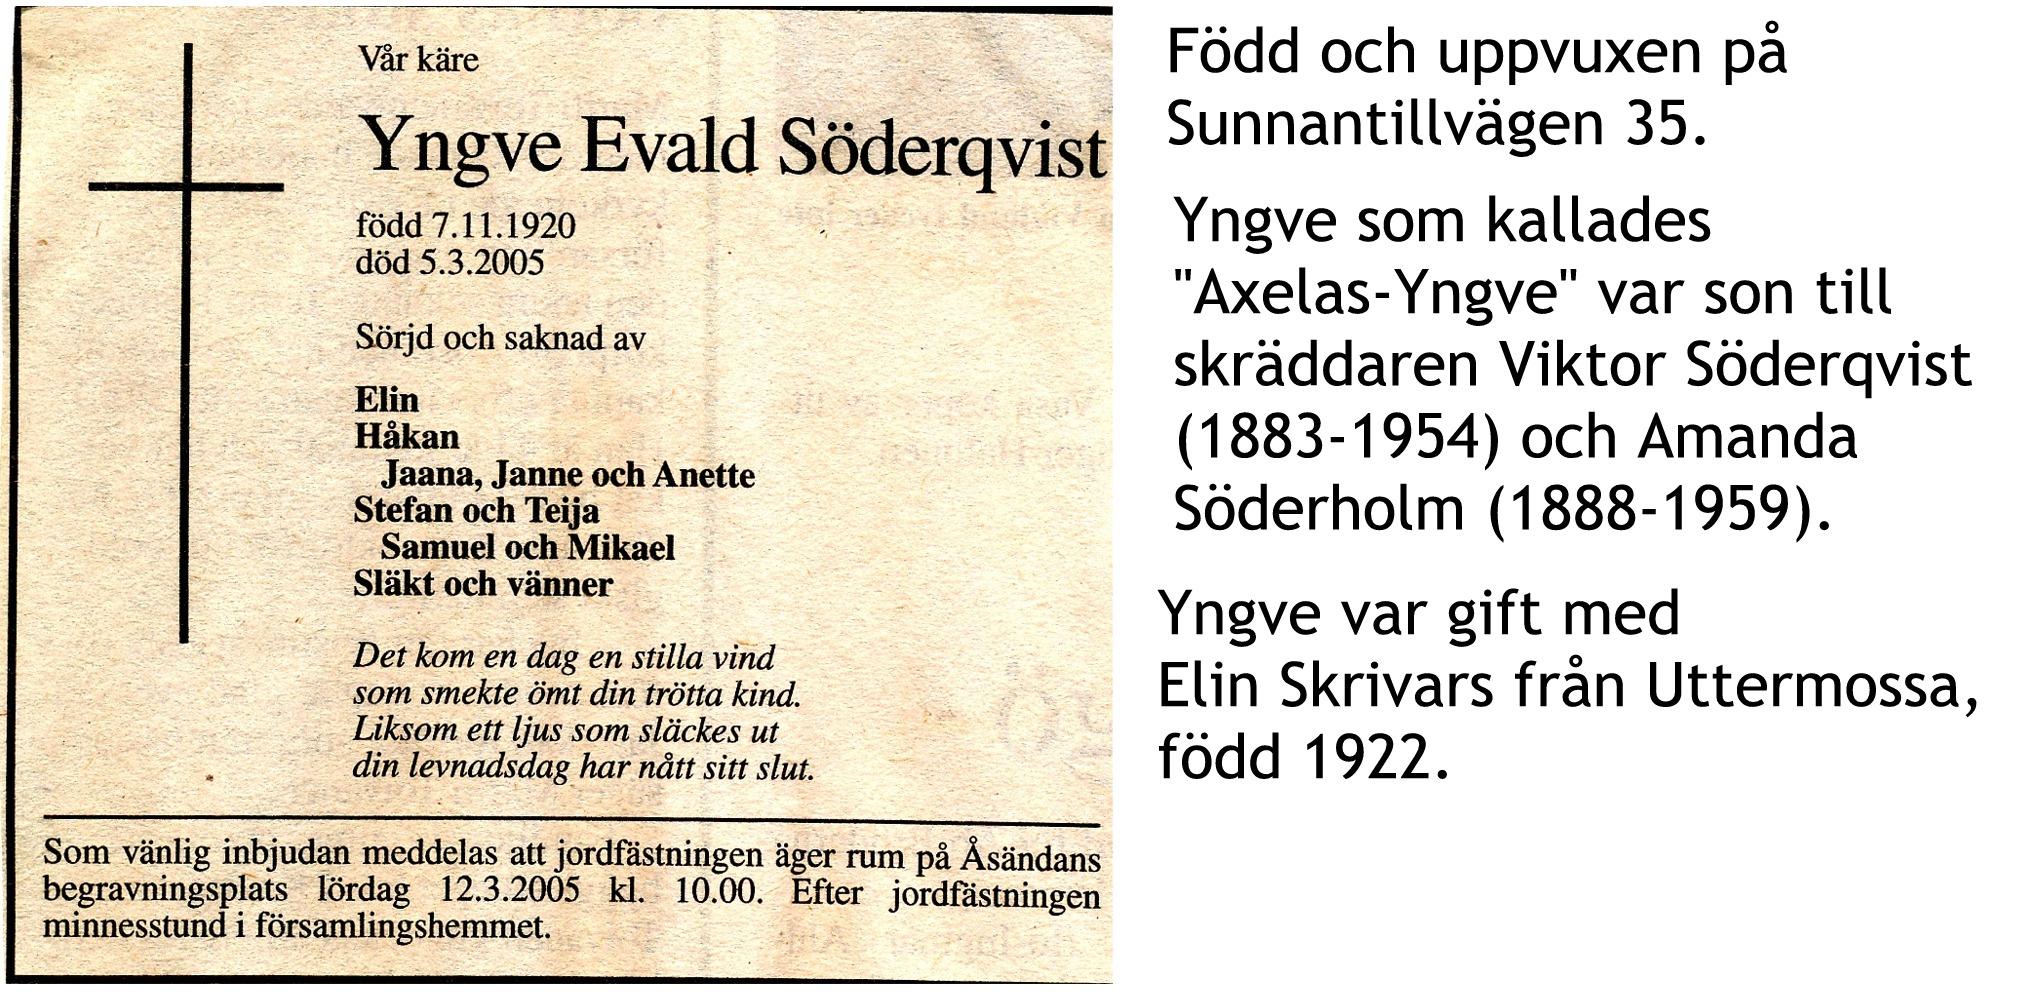 Söderqvist Yngve